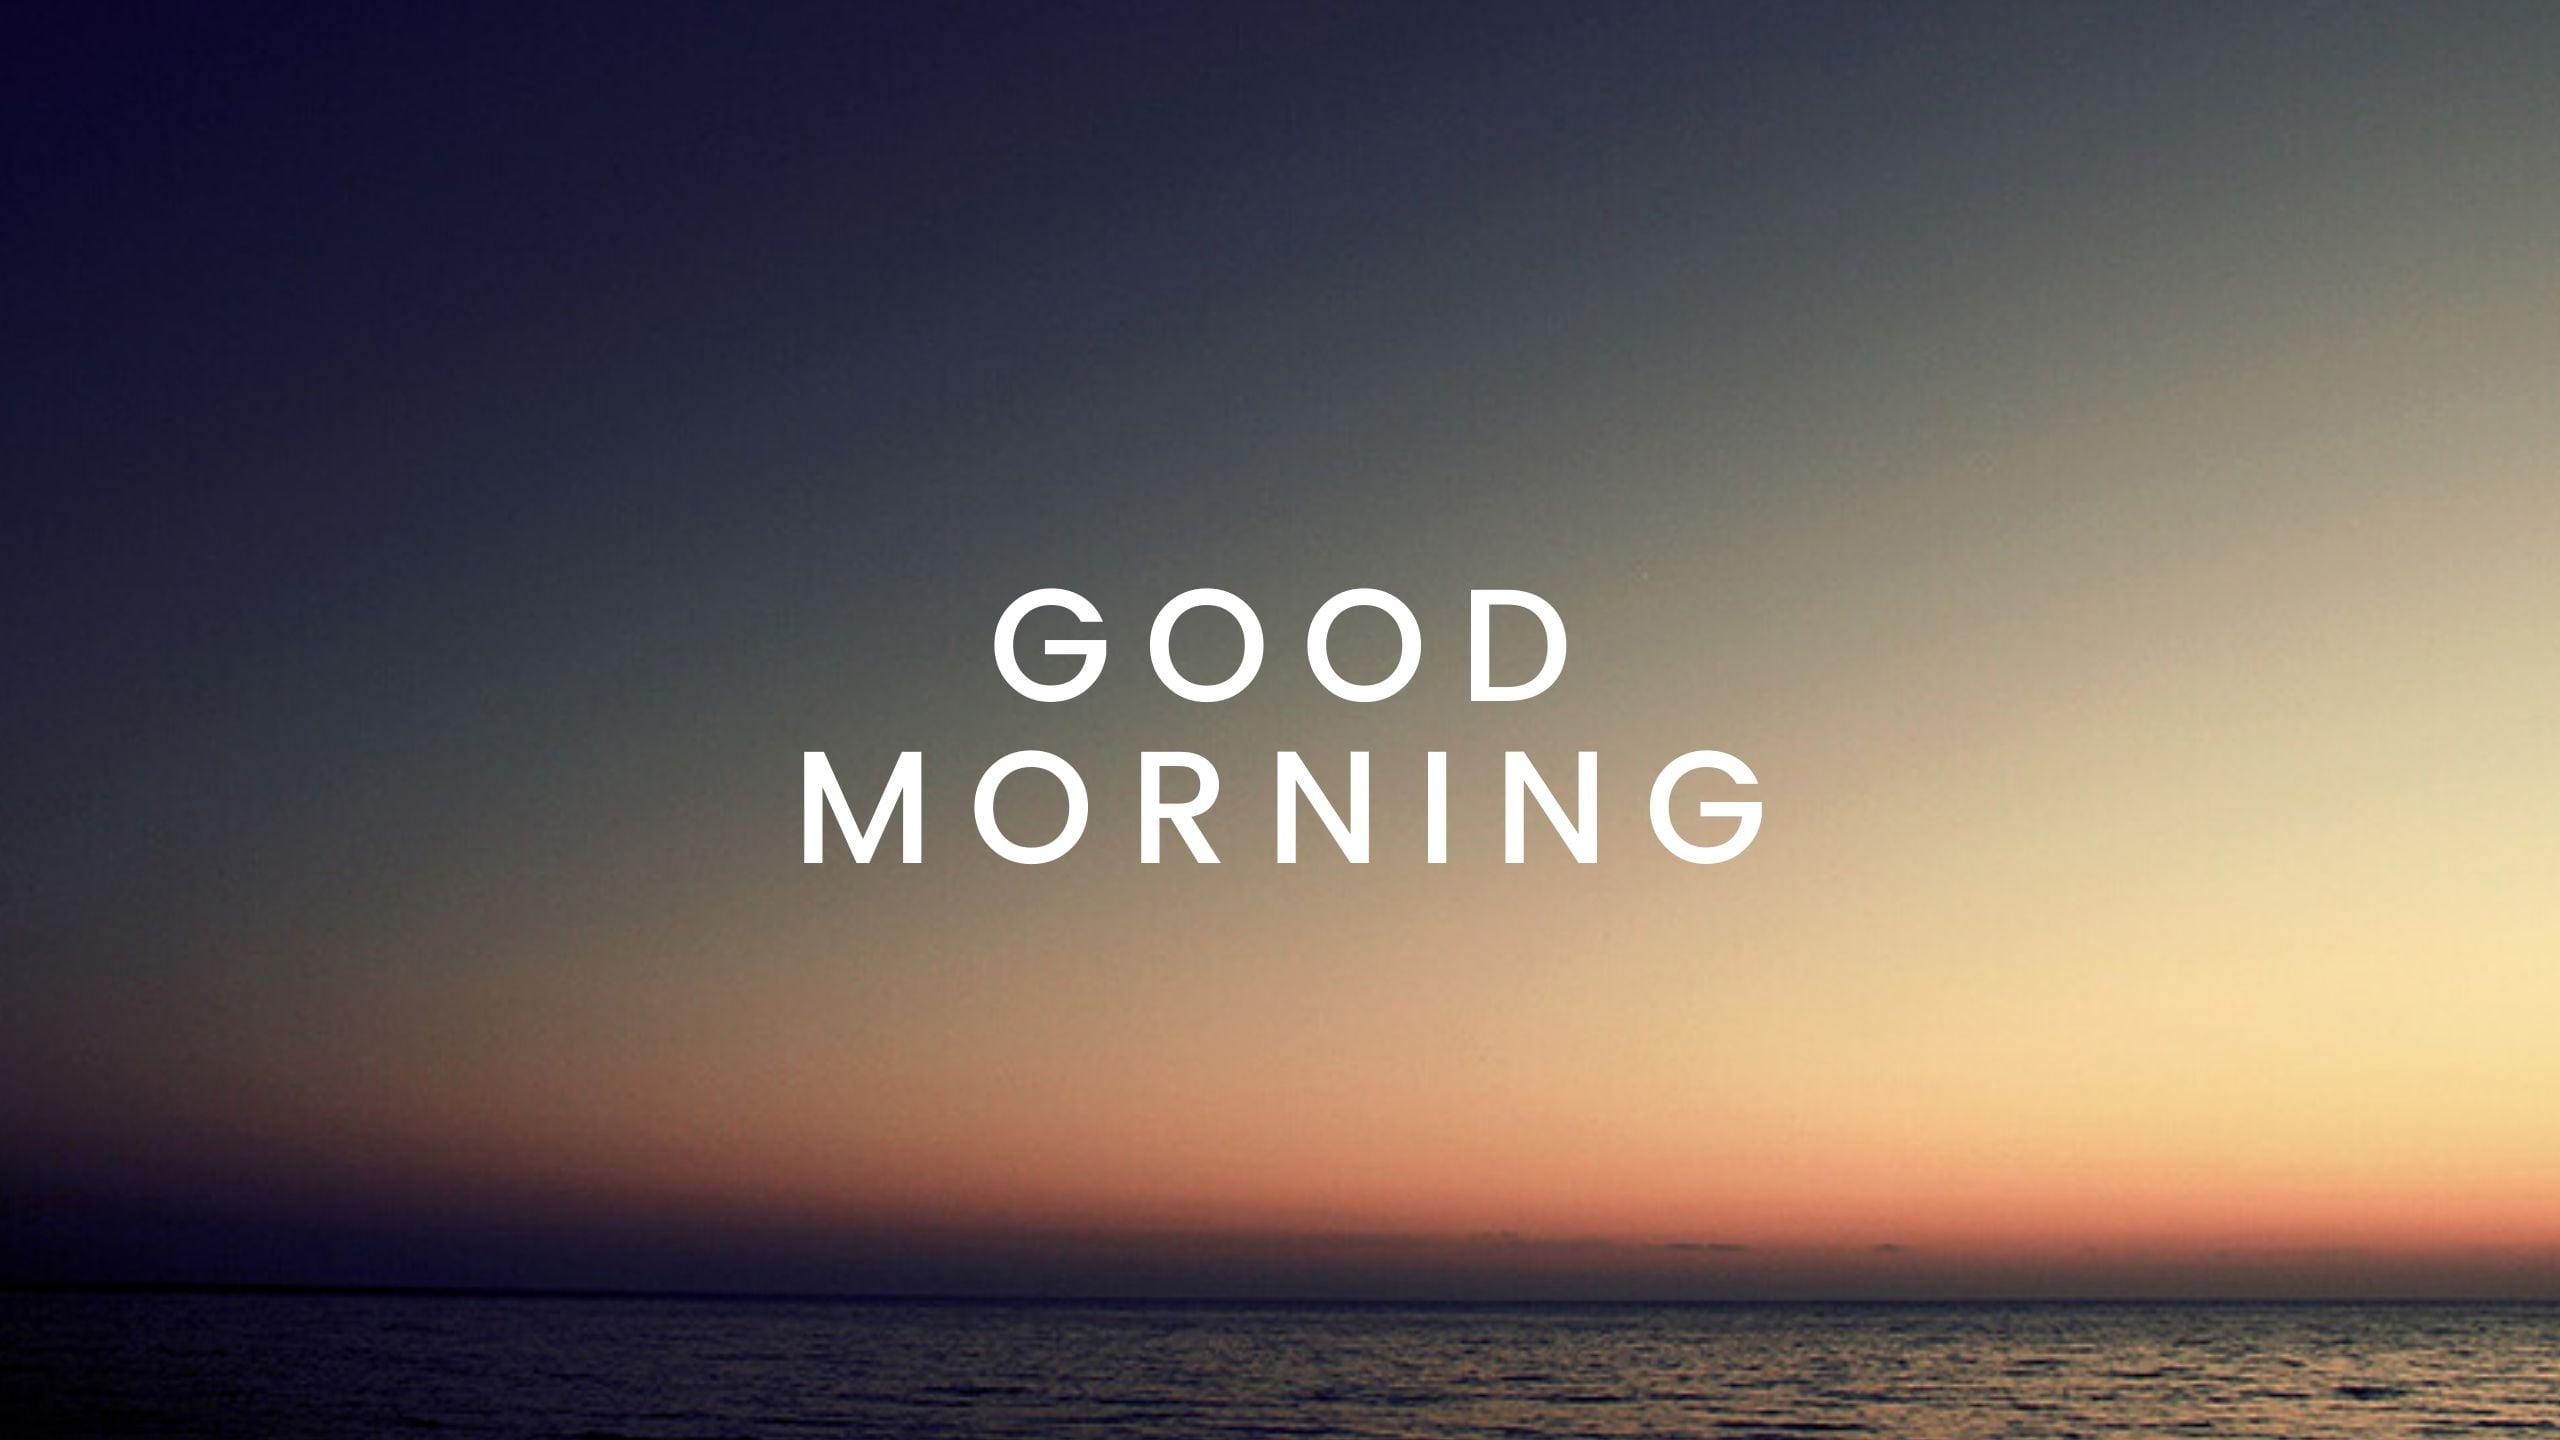 Good Morning Image Sun Rising full HD free download.